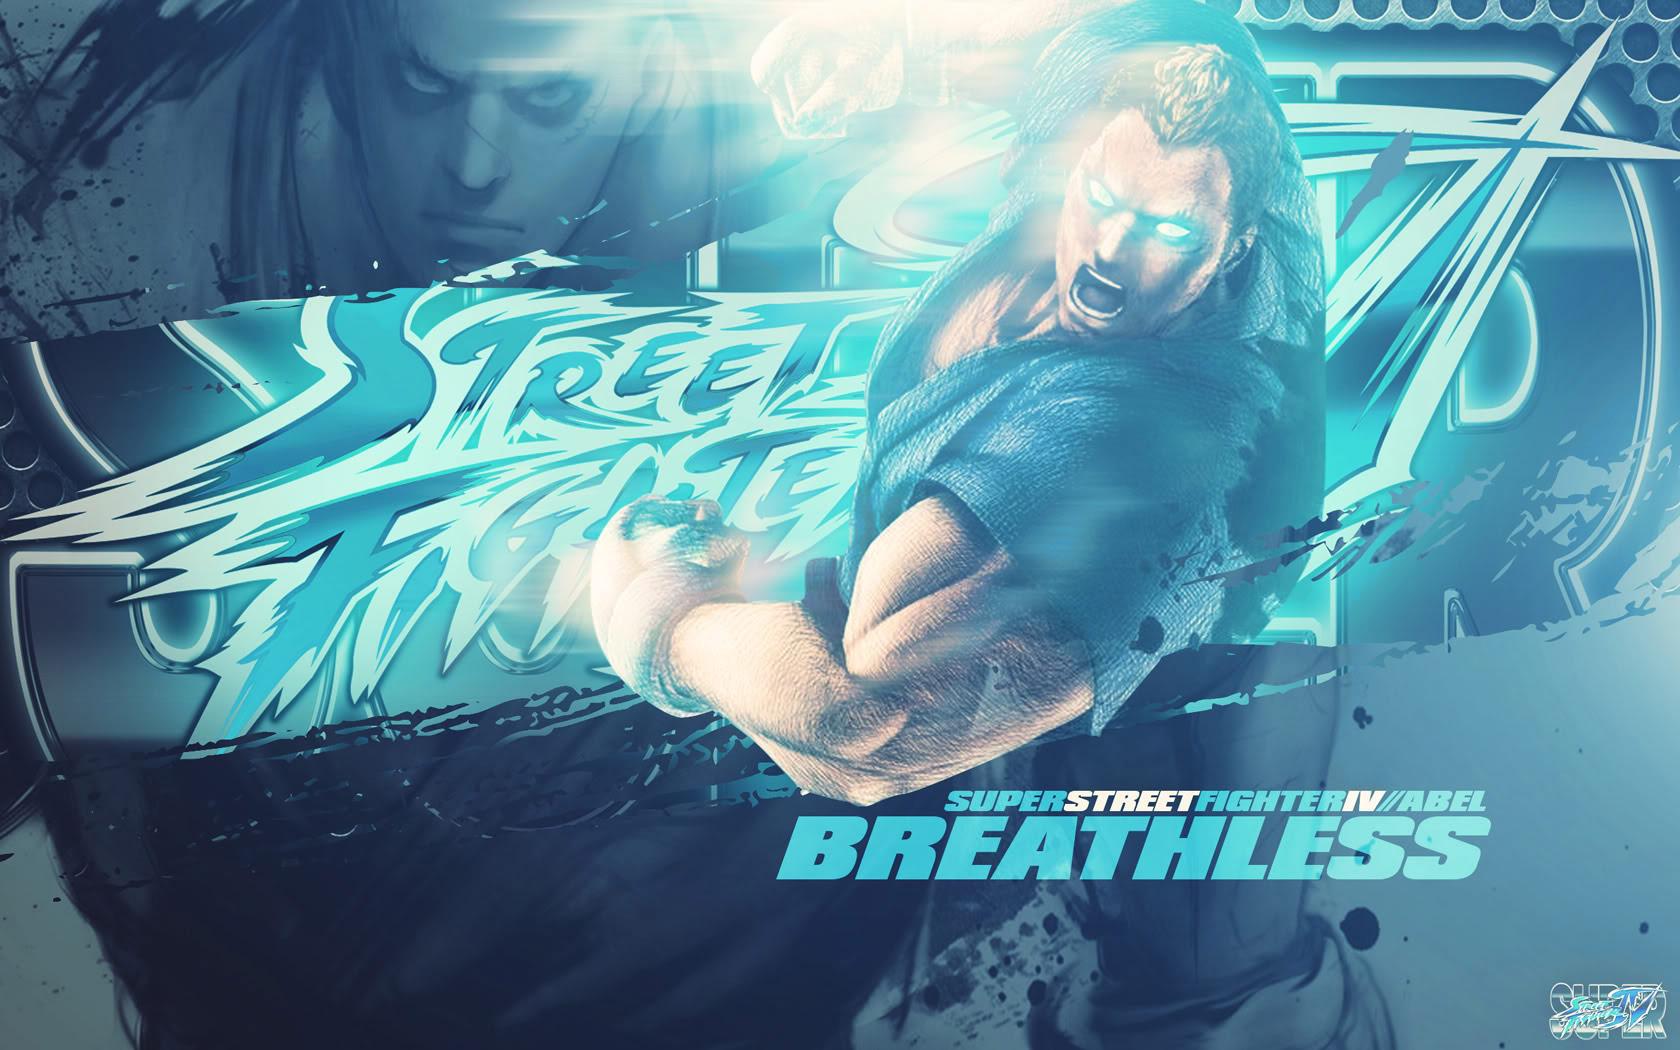 Abel Super Street Fighter 4 wallpaper by BossLogic